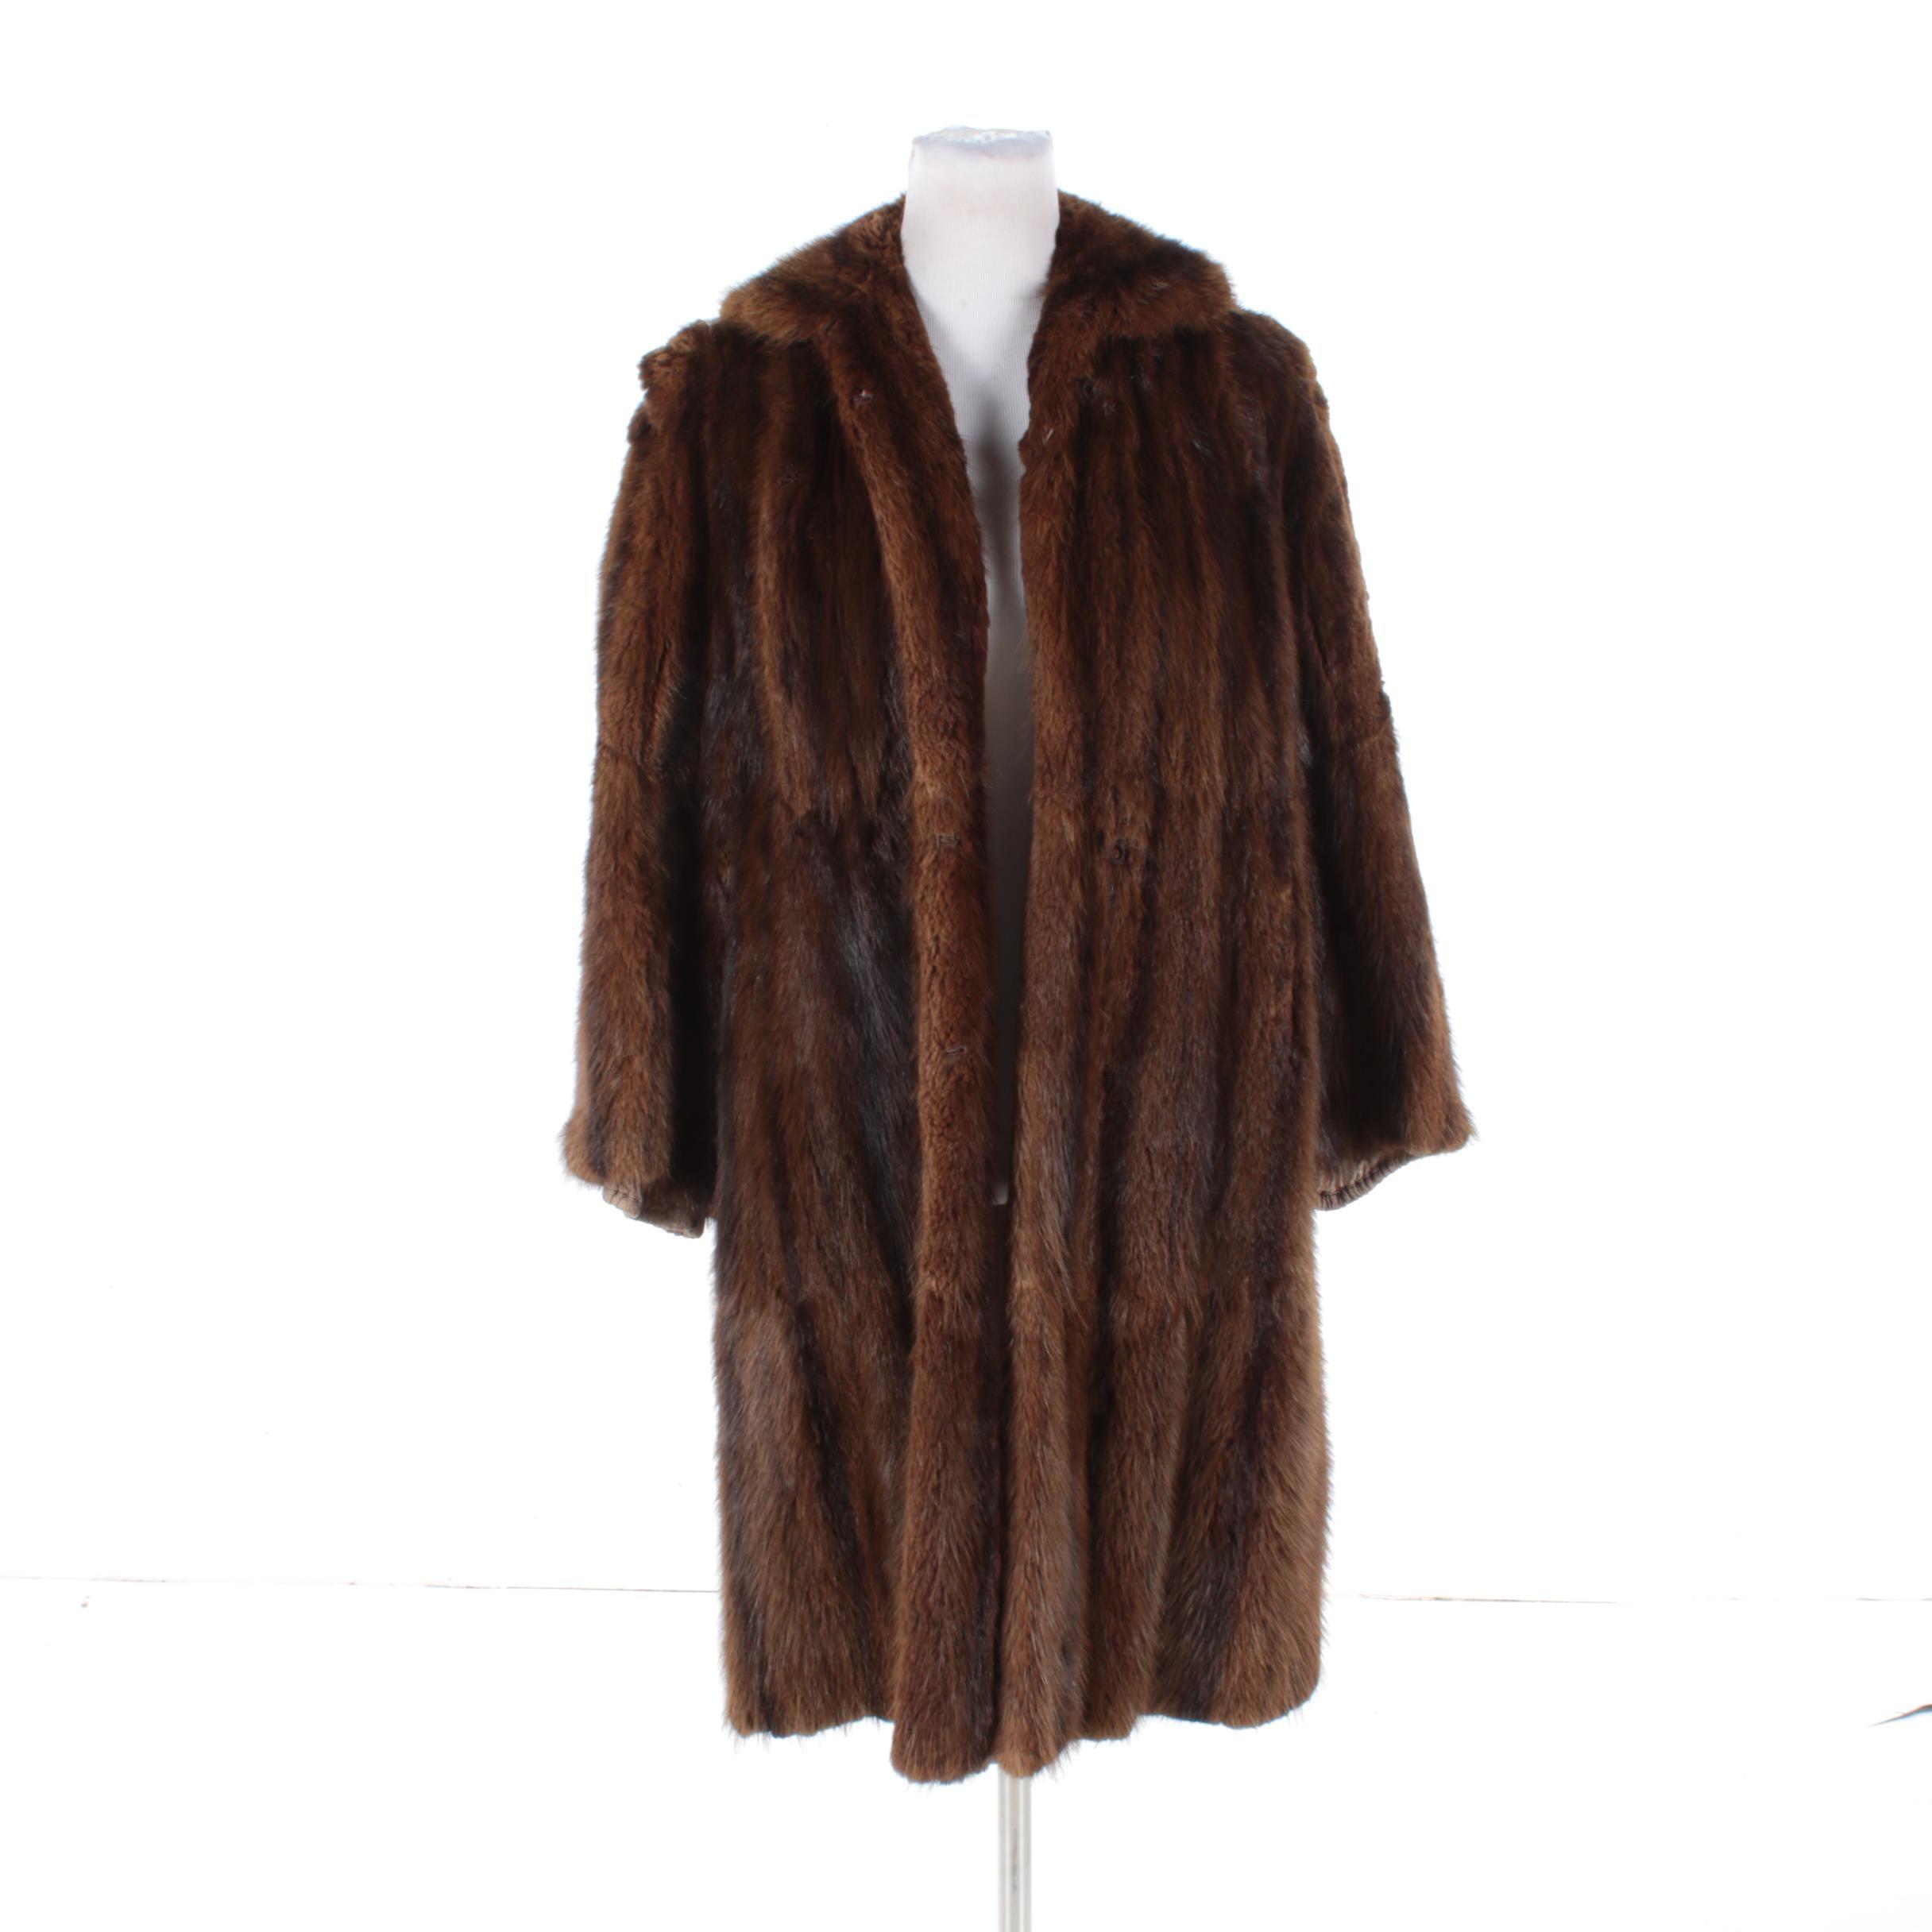 Vintage Clearfield Furs Dyed Muskrat Fur Coat